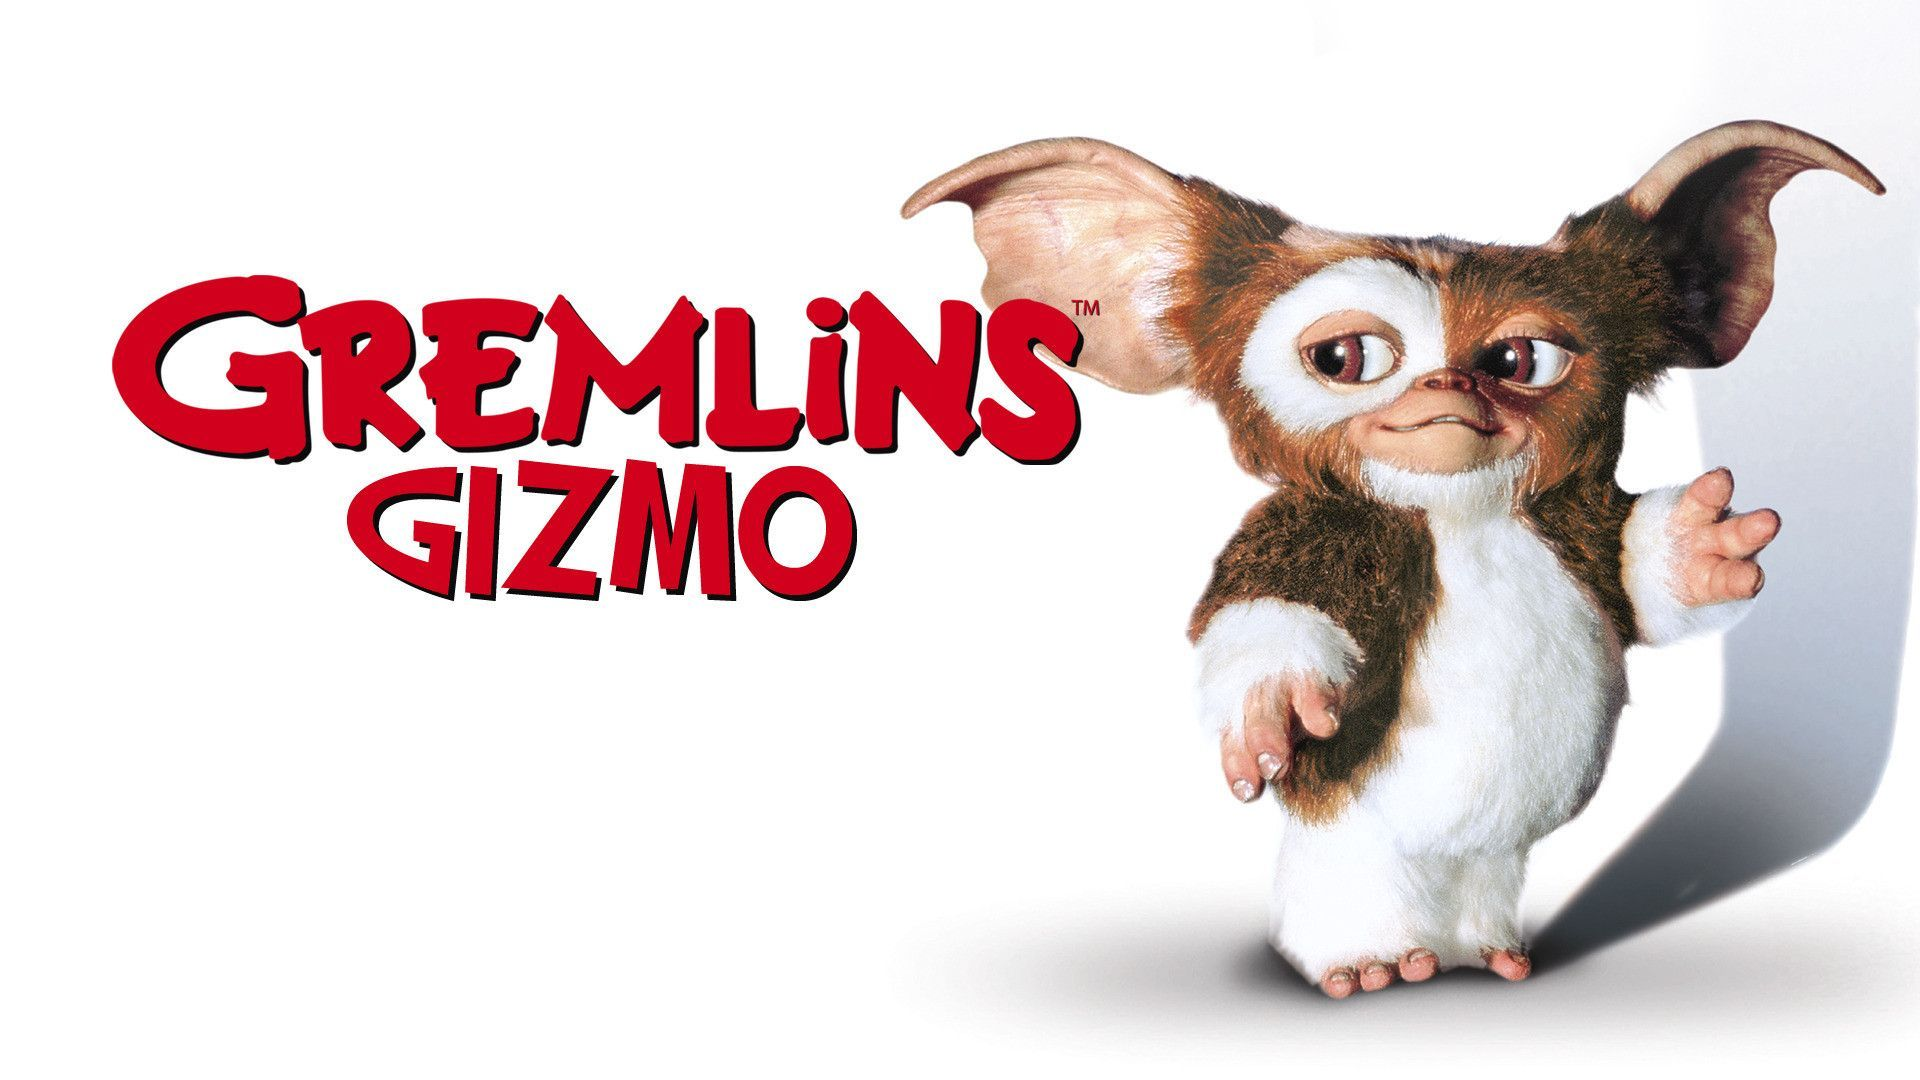 「Gremlins WALLPAPER」的圖片搜尋結果